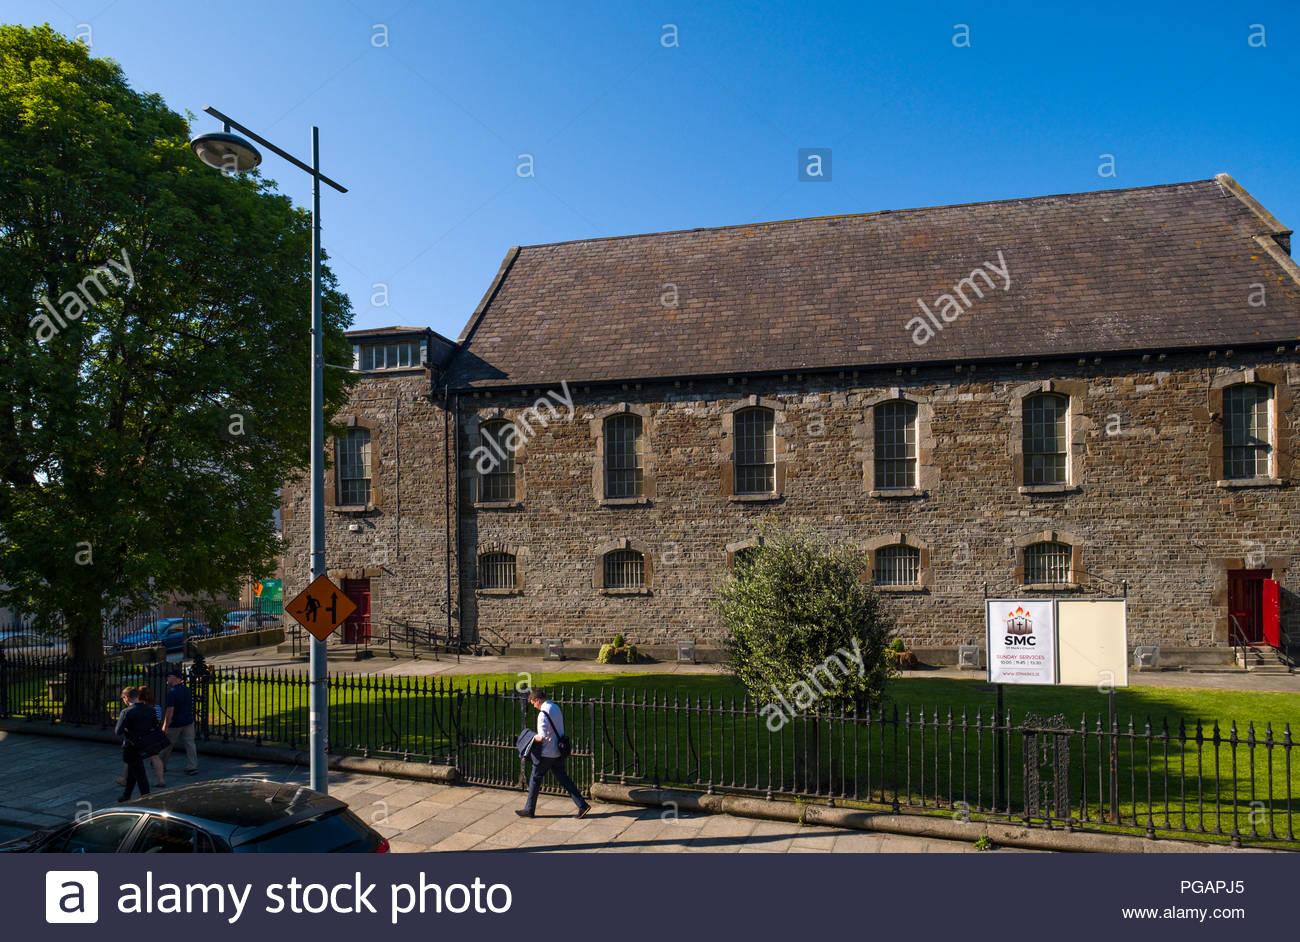 St. Marks Church, Pearse Street, Dublin, Leinster, Ireland - Stock Image